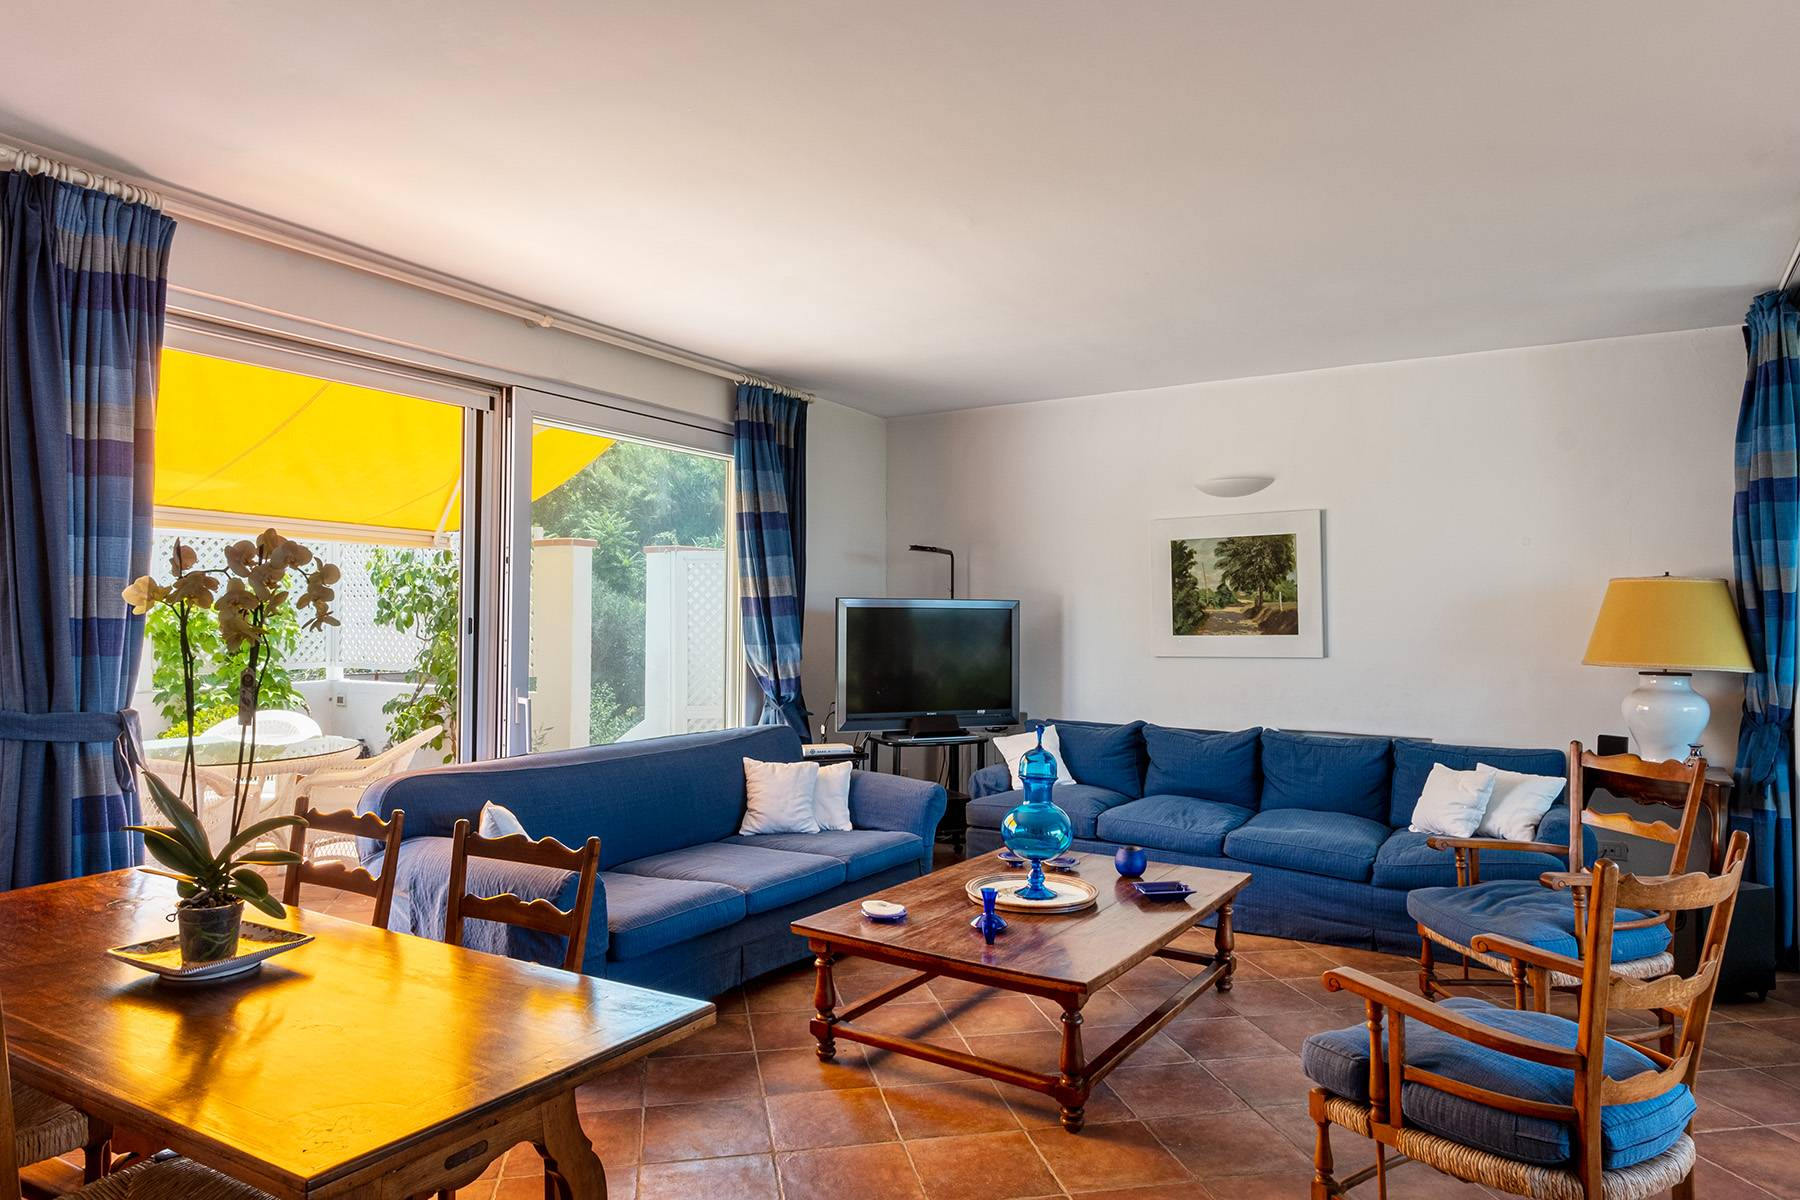 Villa in Vendita a Ischia: 5 locali, 400 mq - Foto 6